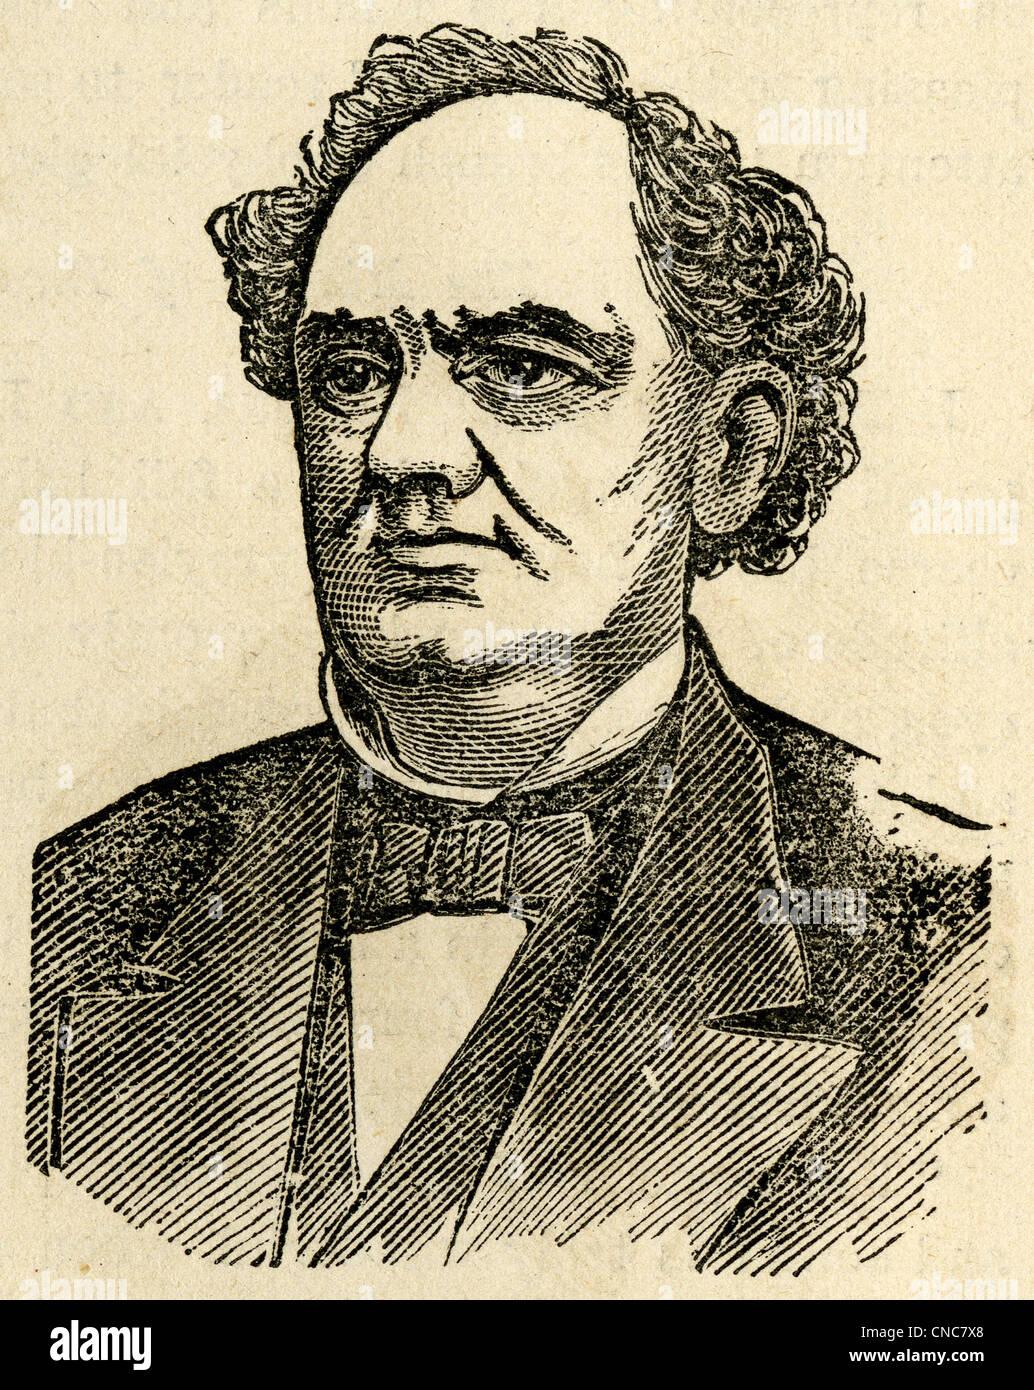 Simple 1871 woodcut engraving of pt barnum stock photo royalty simple 1871 woodcut engraving of pt barnum stopboris Choice Image